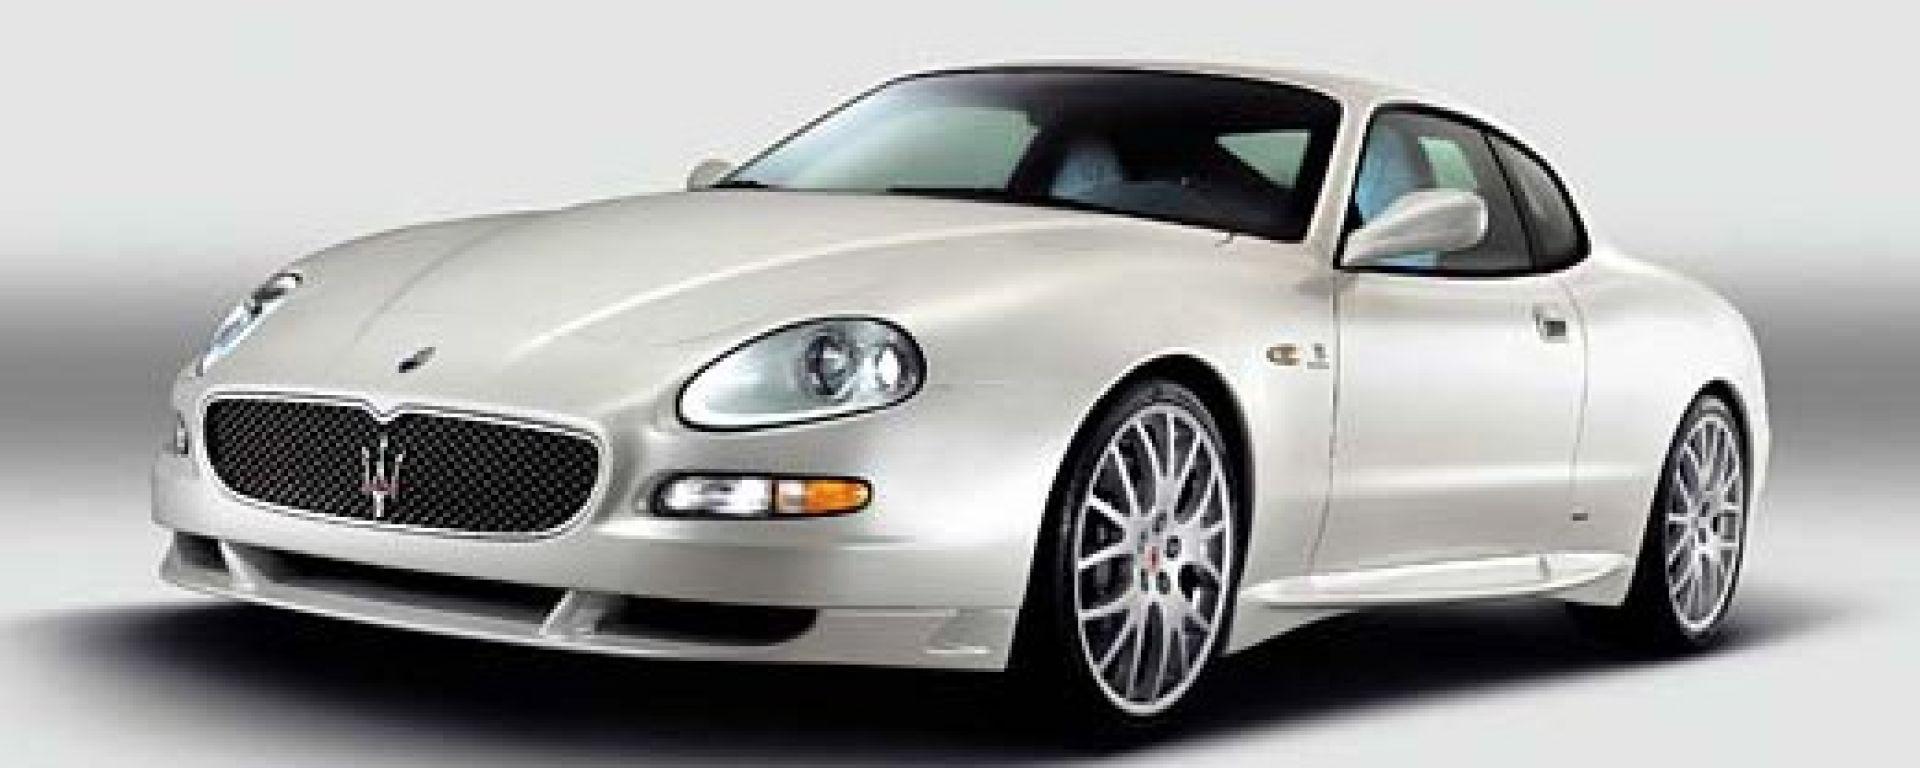 Anteprima: Maserati GranSport